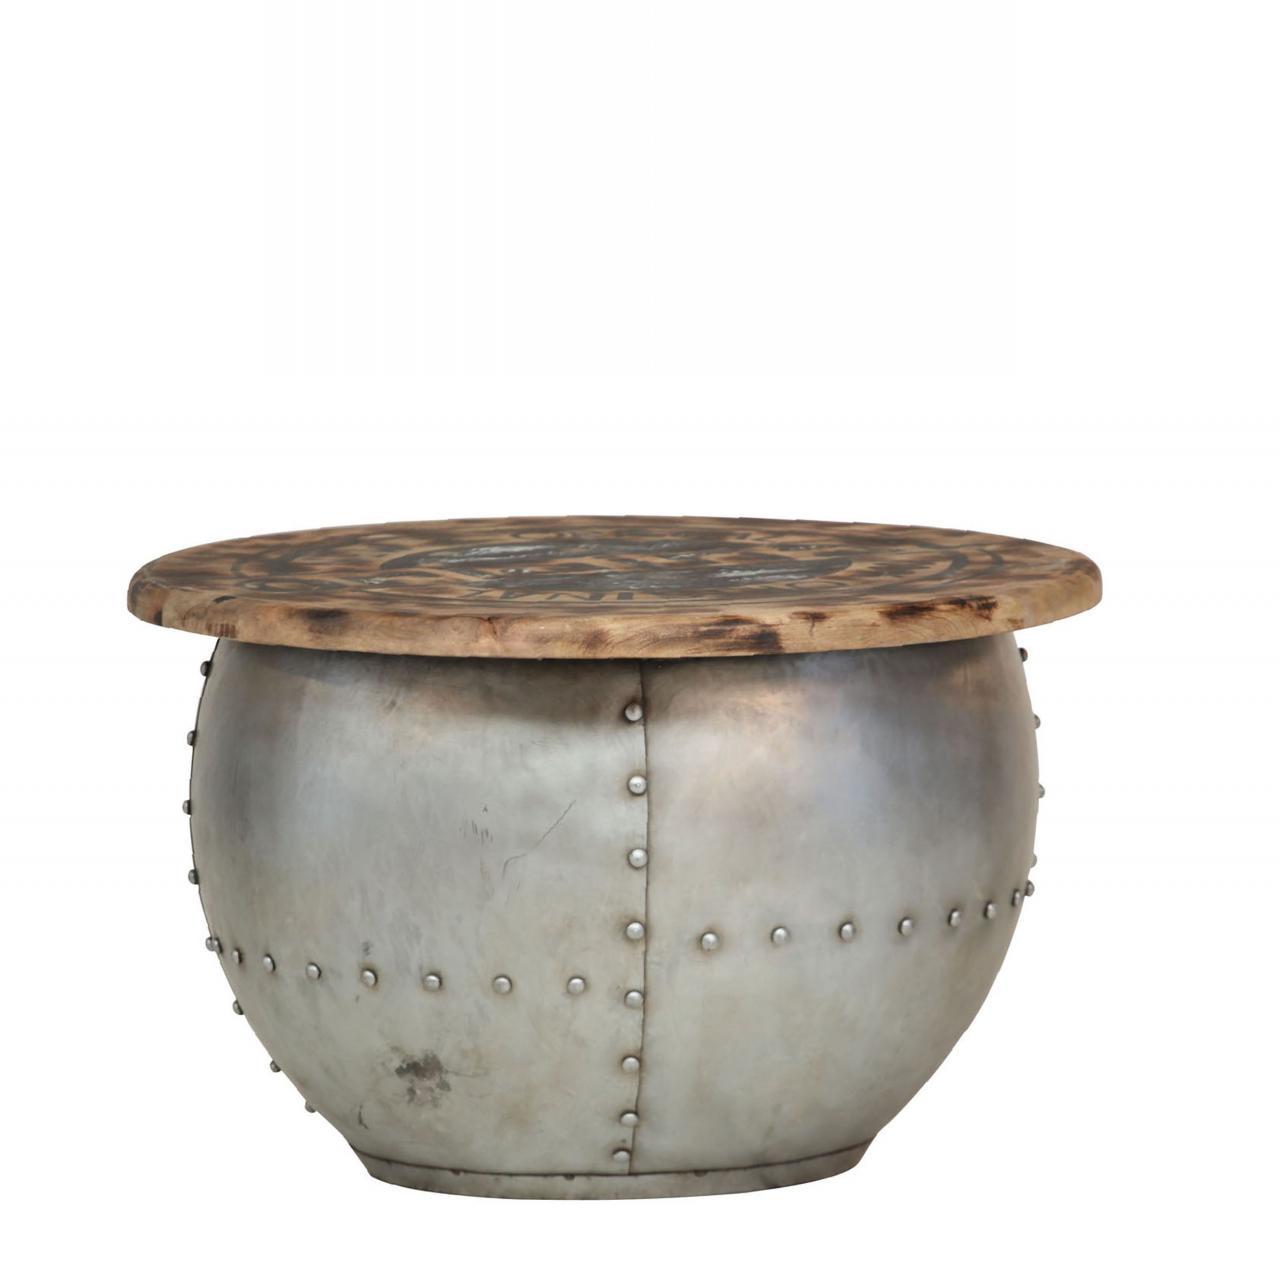 Couchtisch Cheesy Metall Silber Anthrazit Lackiert Stubentisch Mangoholz